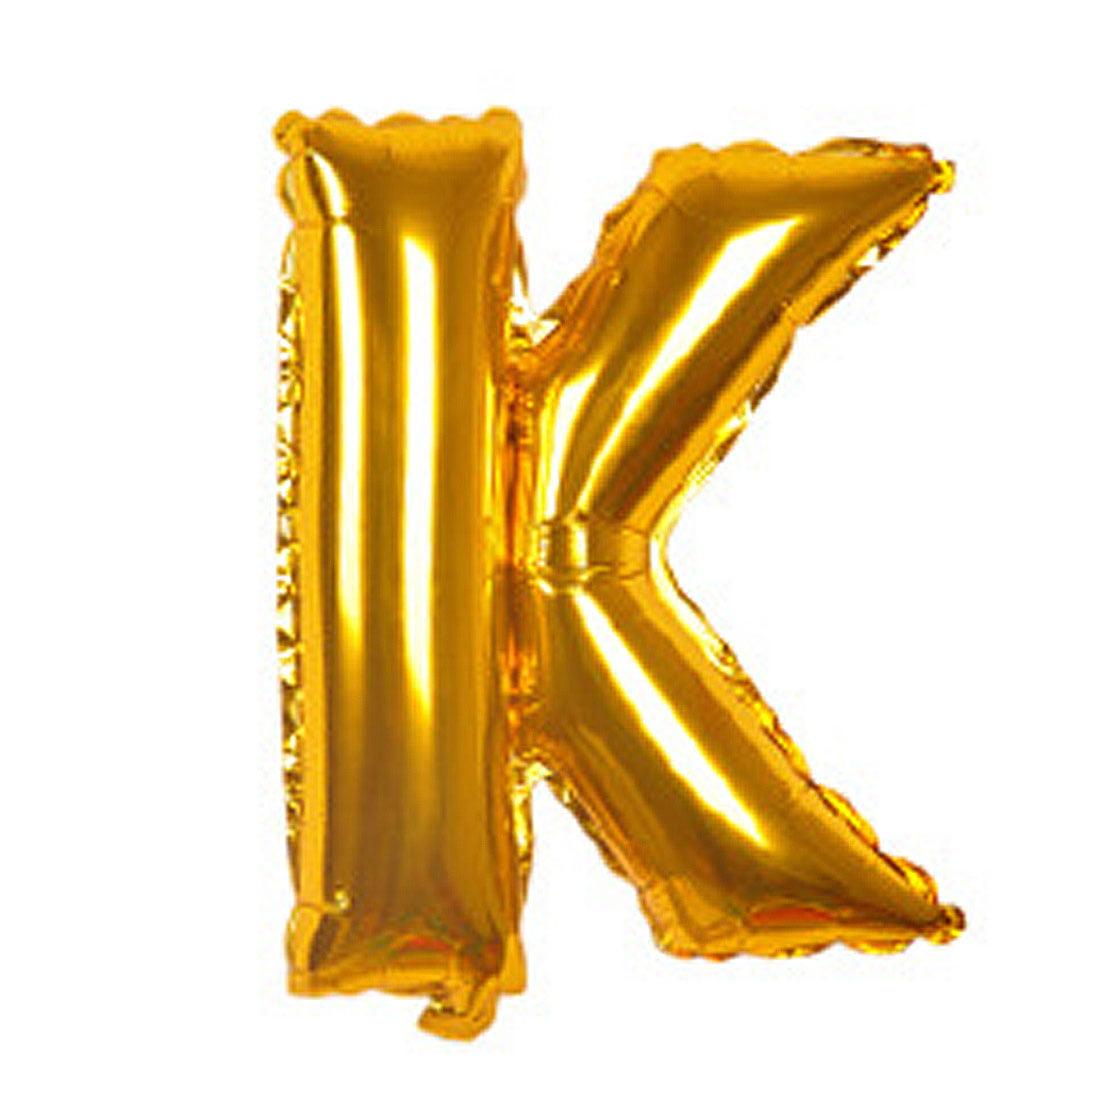 "Unique Bargains 40"" Gold Tone Foil Letter K Balloon Helium Birthday Wedding Festival Decor"